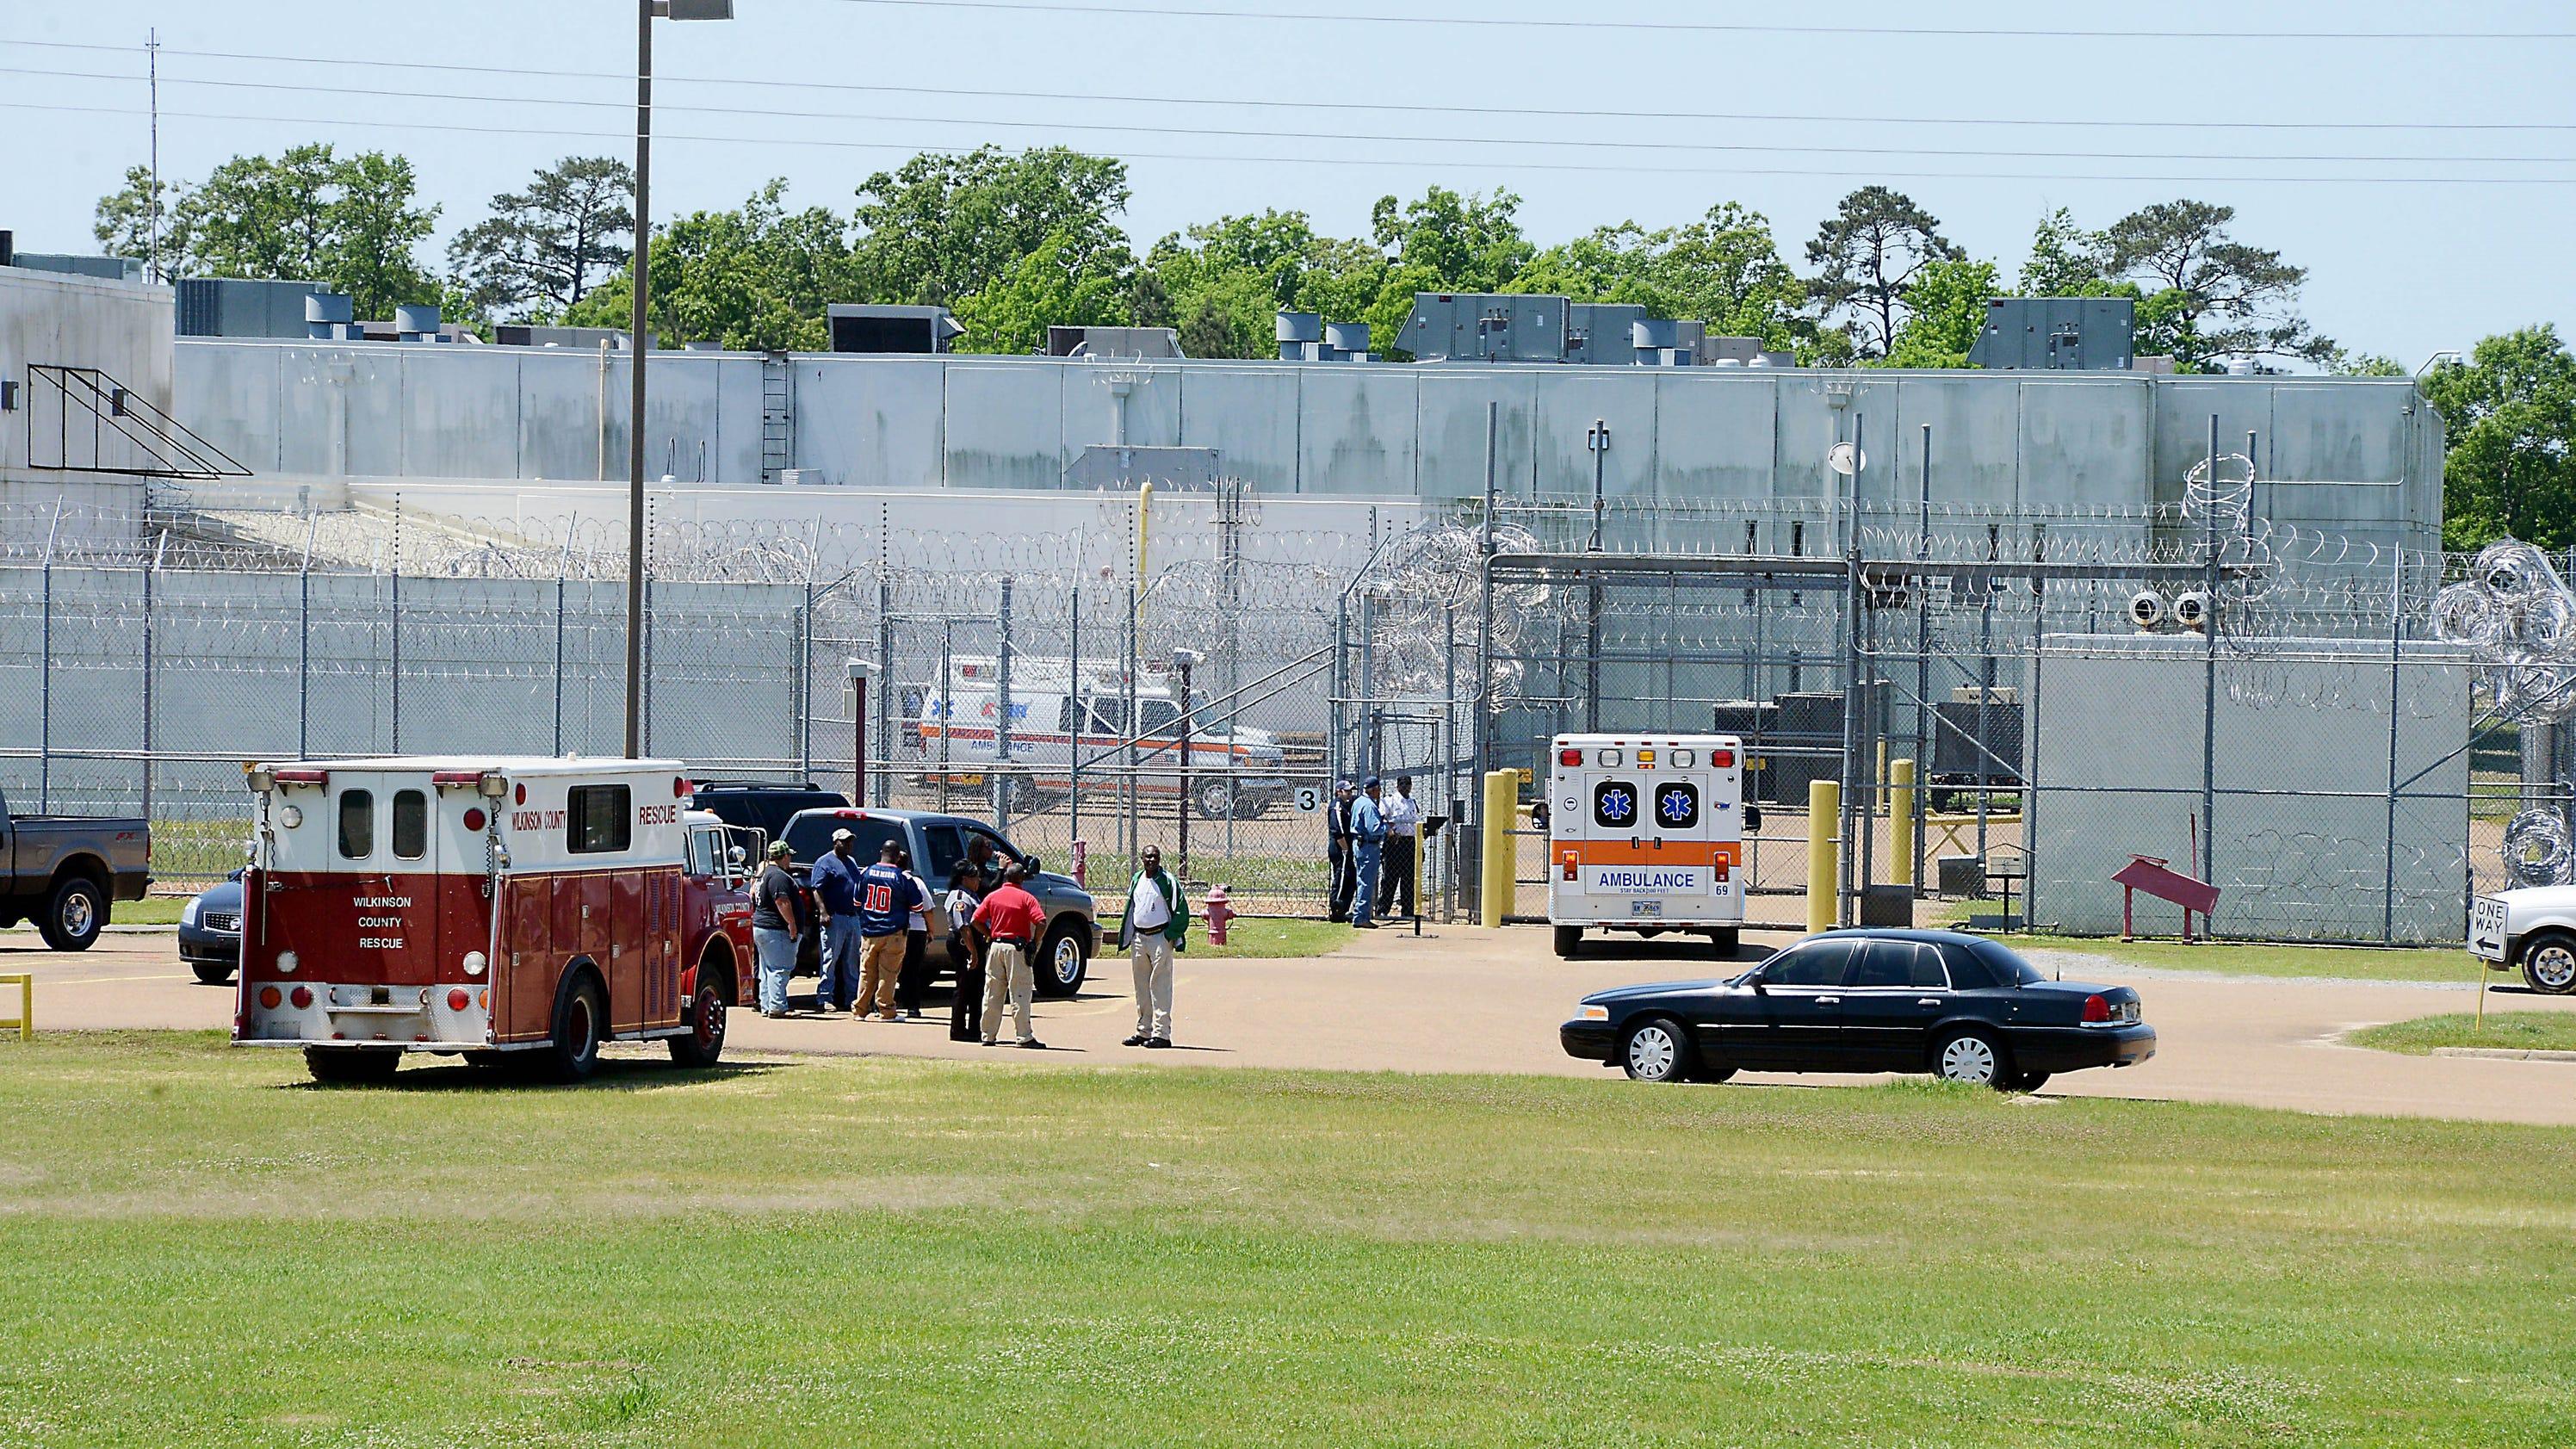 Used Cars Jackson Ms >> 'Killing Field': Prison gangs roam with homemade swords